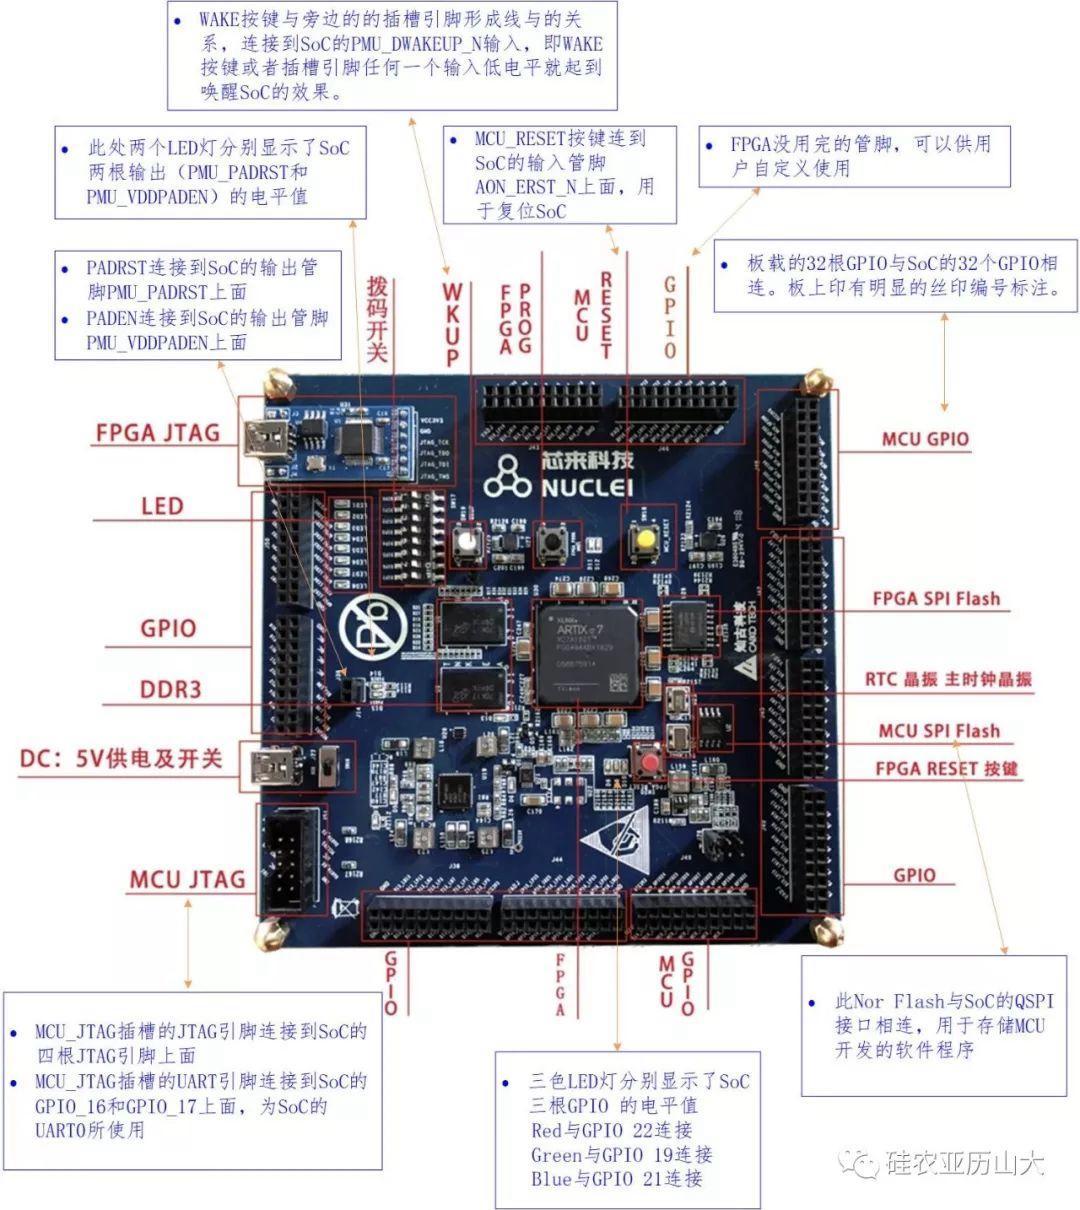 Hummingbird E203 open source RISC-V development board: Hummingbird